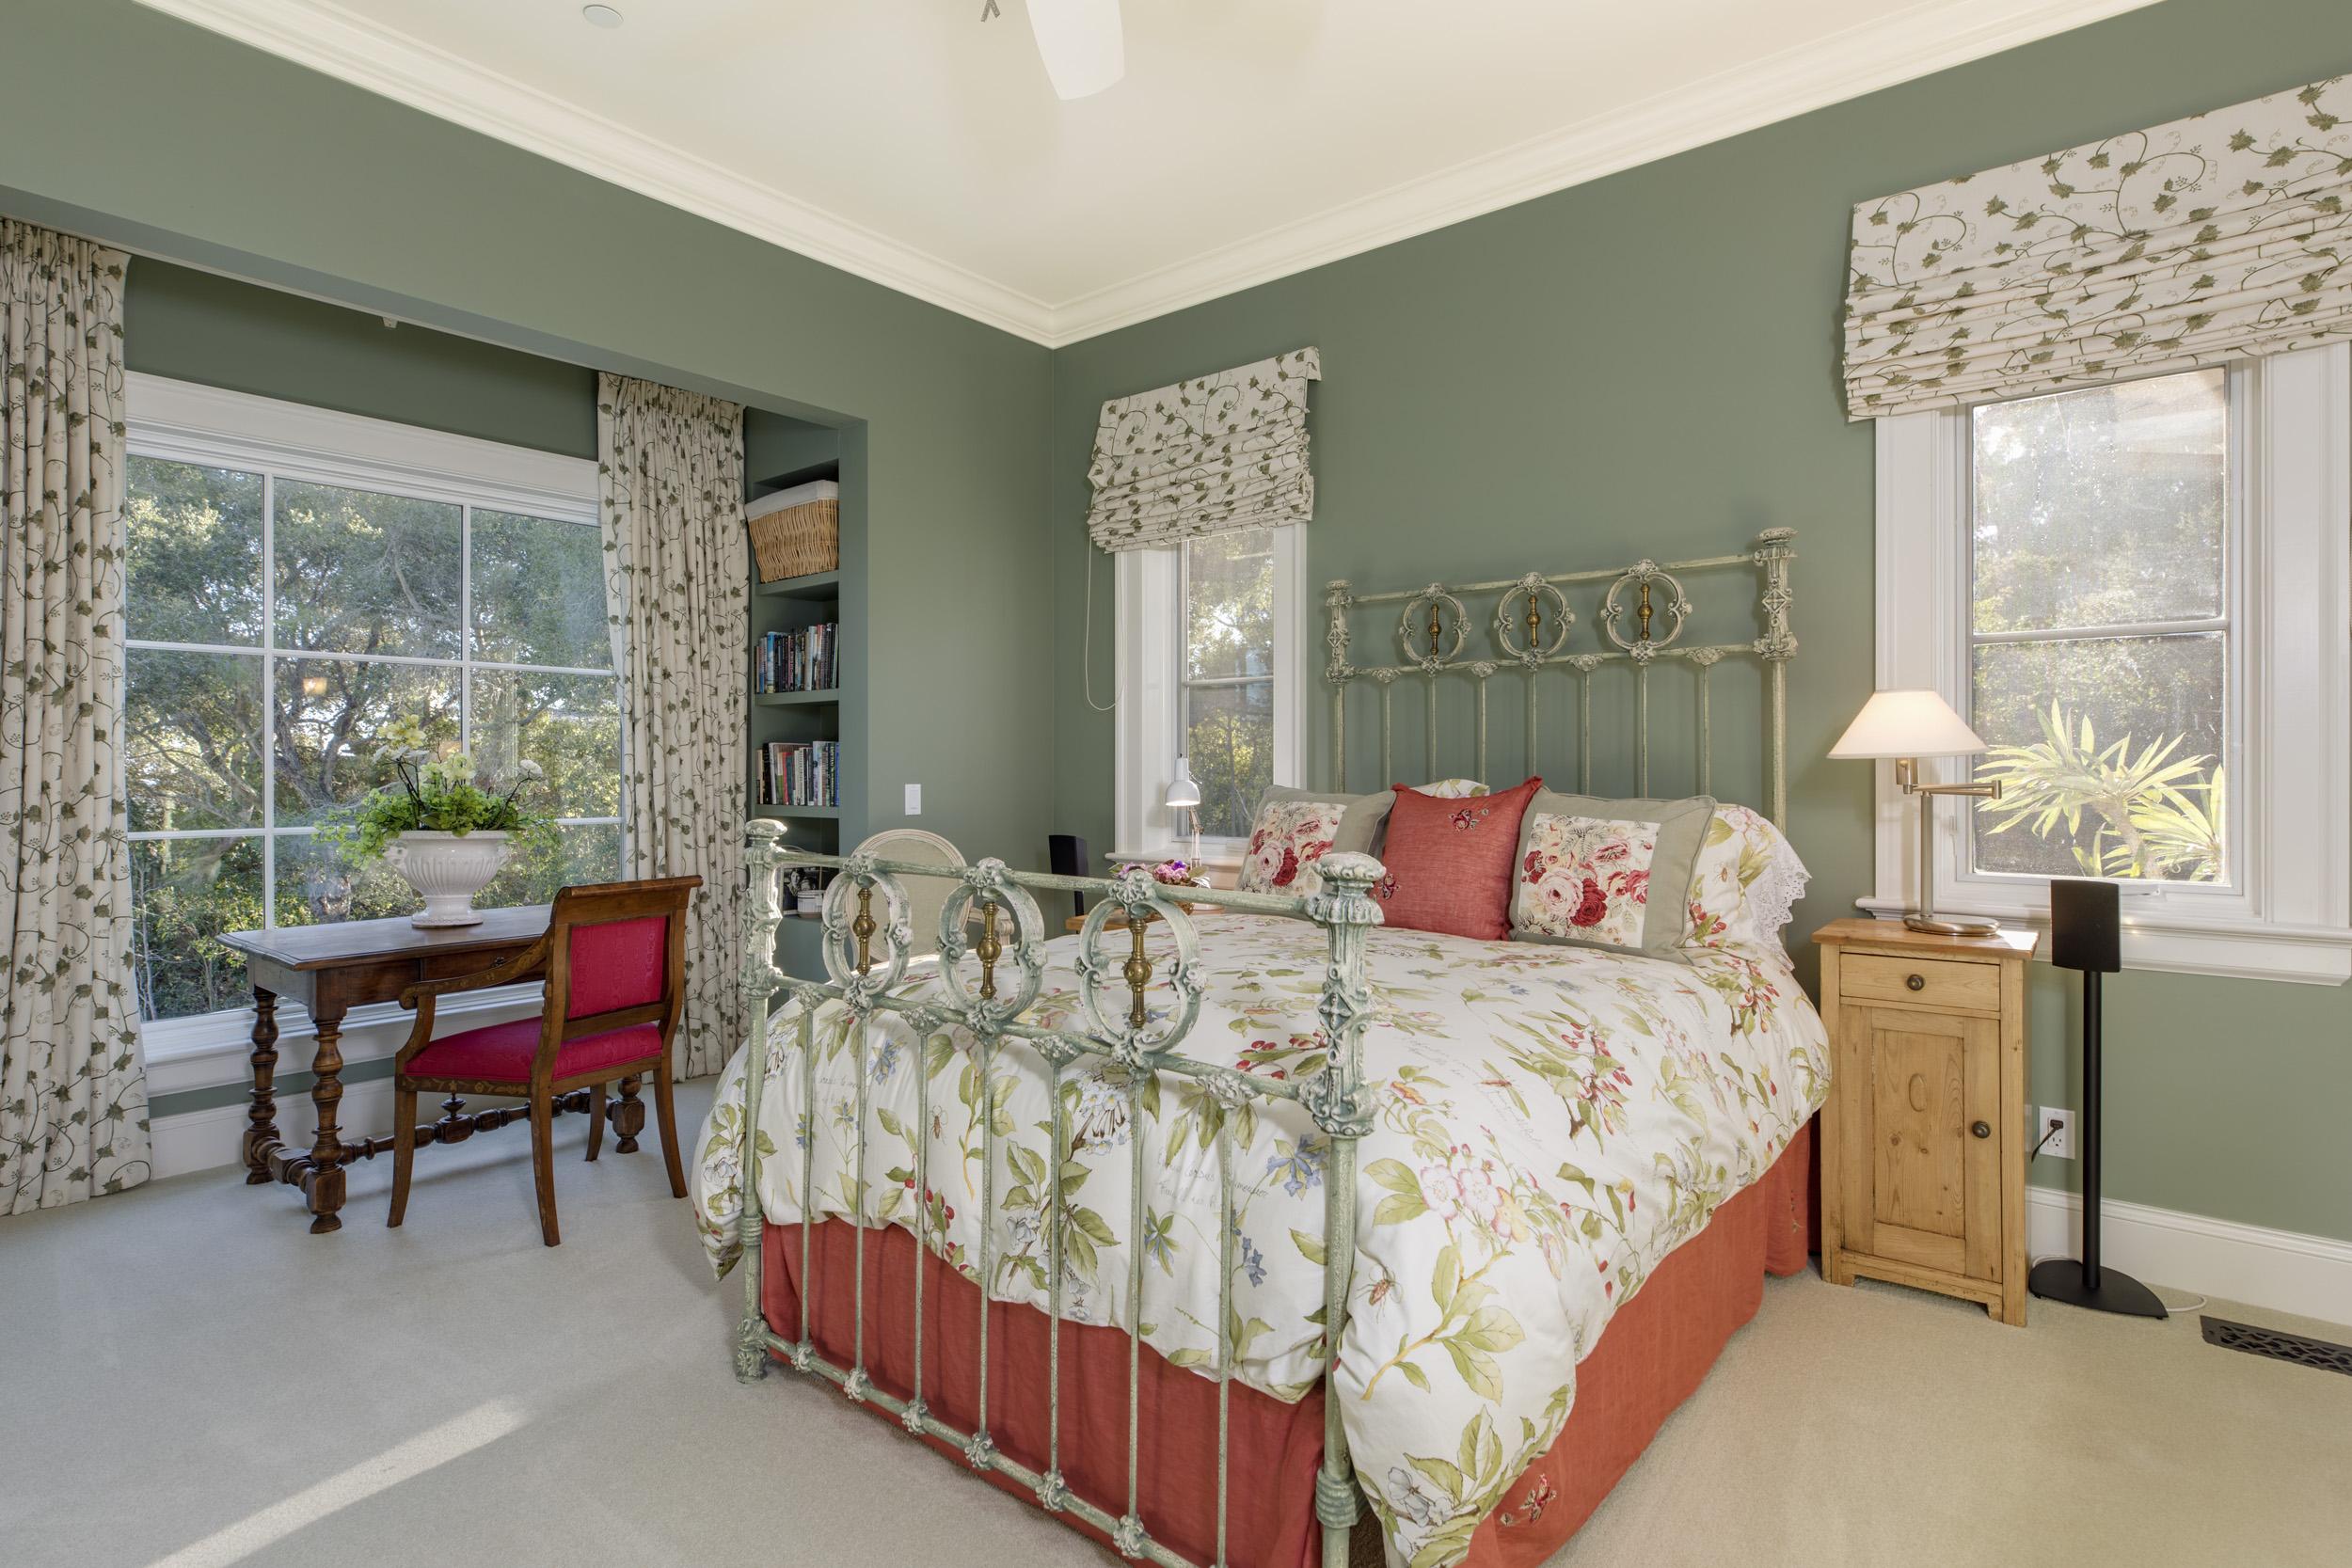 Entry Bedroom Suite 1